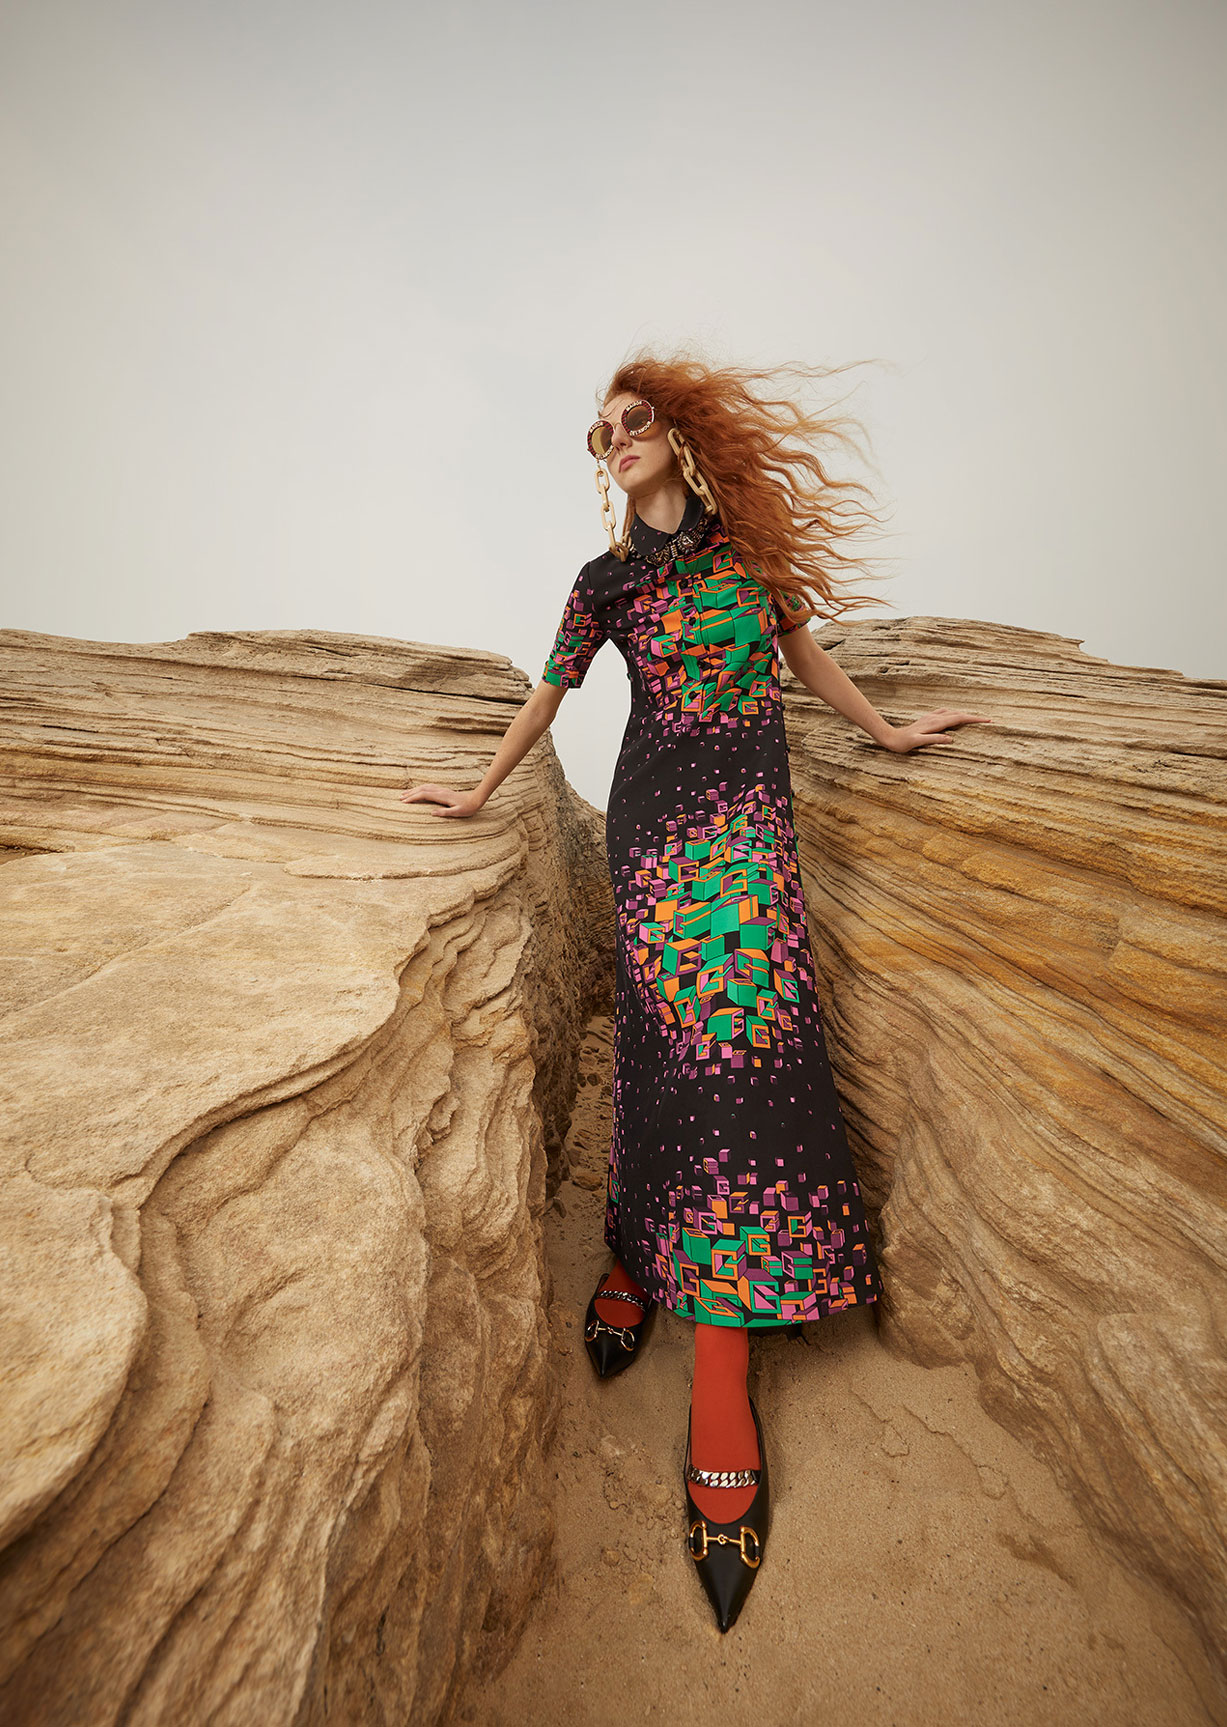 Модный маскарад в журнале Grazia / фото 11